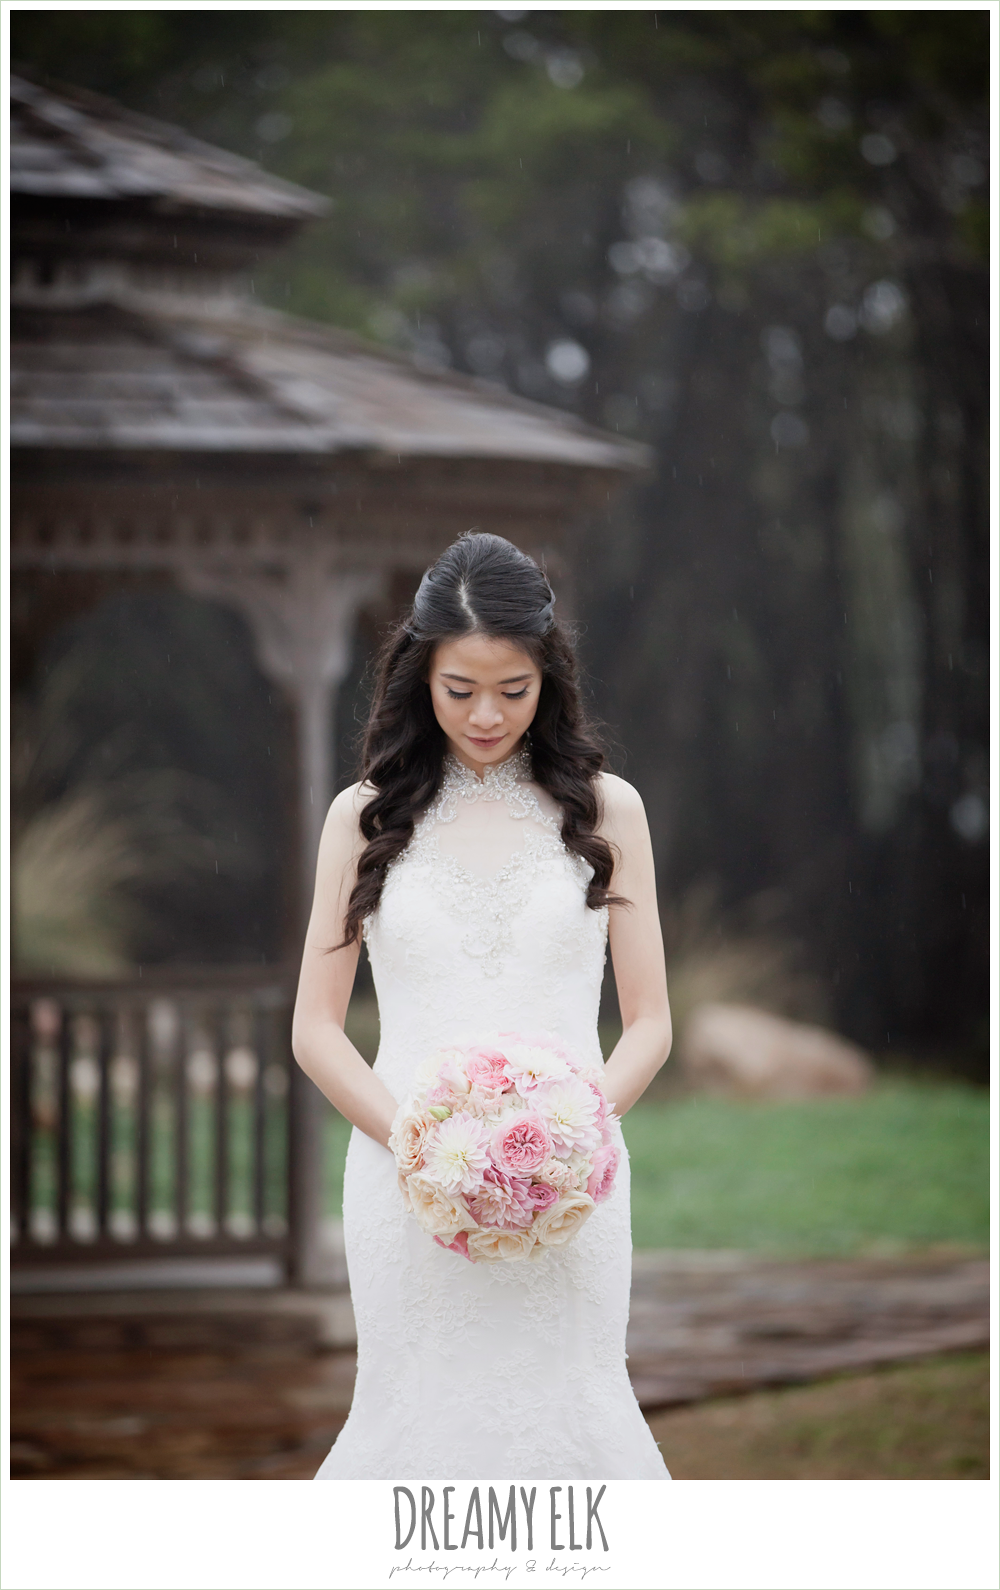 high necked wedding dress, foggy wedding day {dreamy elk photography and design}